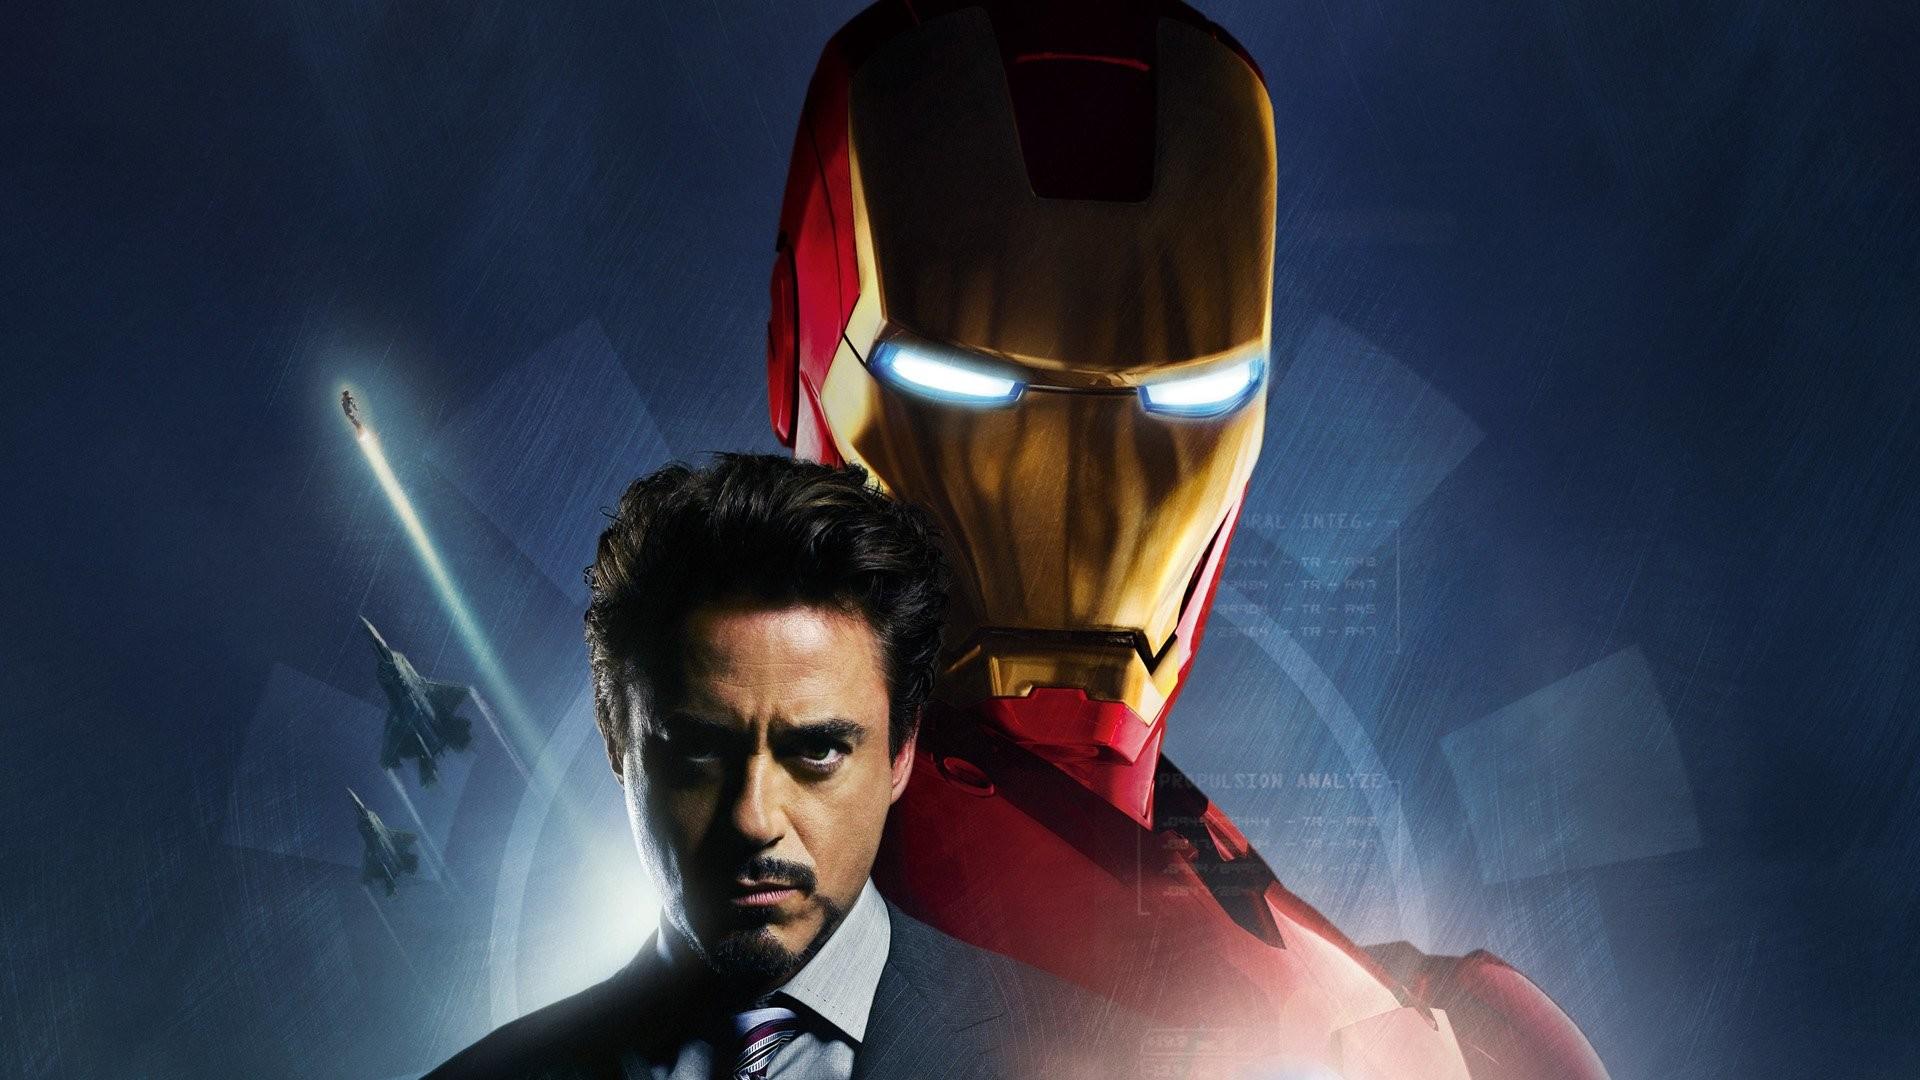 Tony Stark Wallpaper (67+ images)